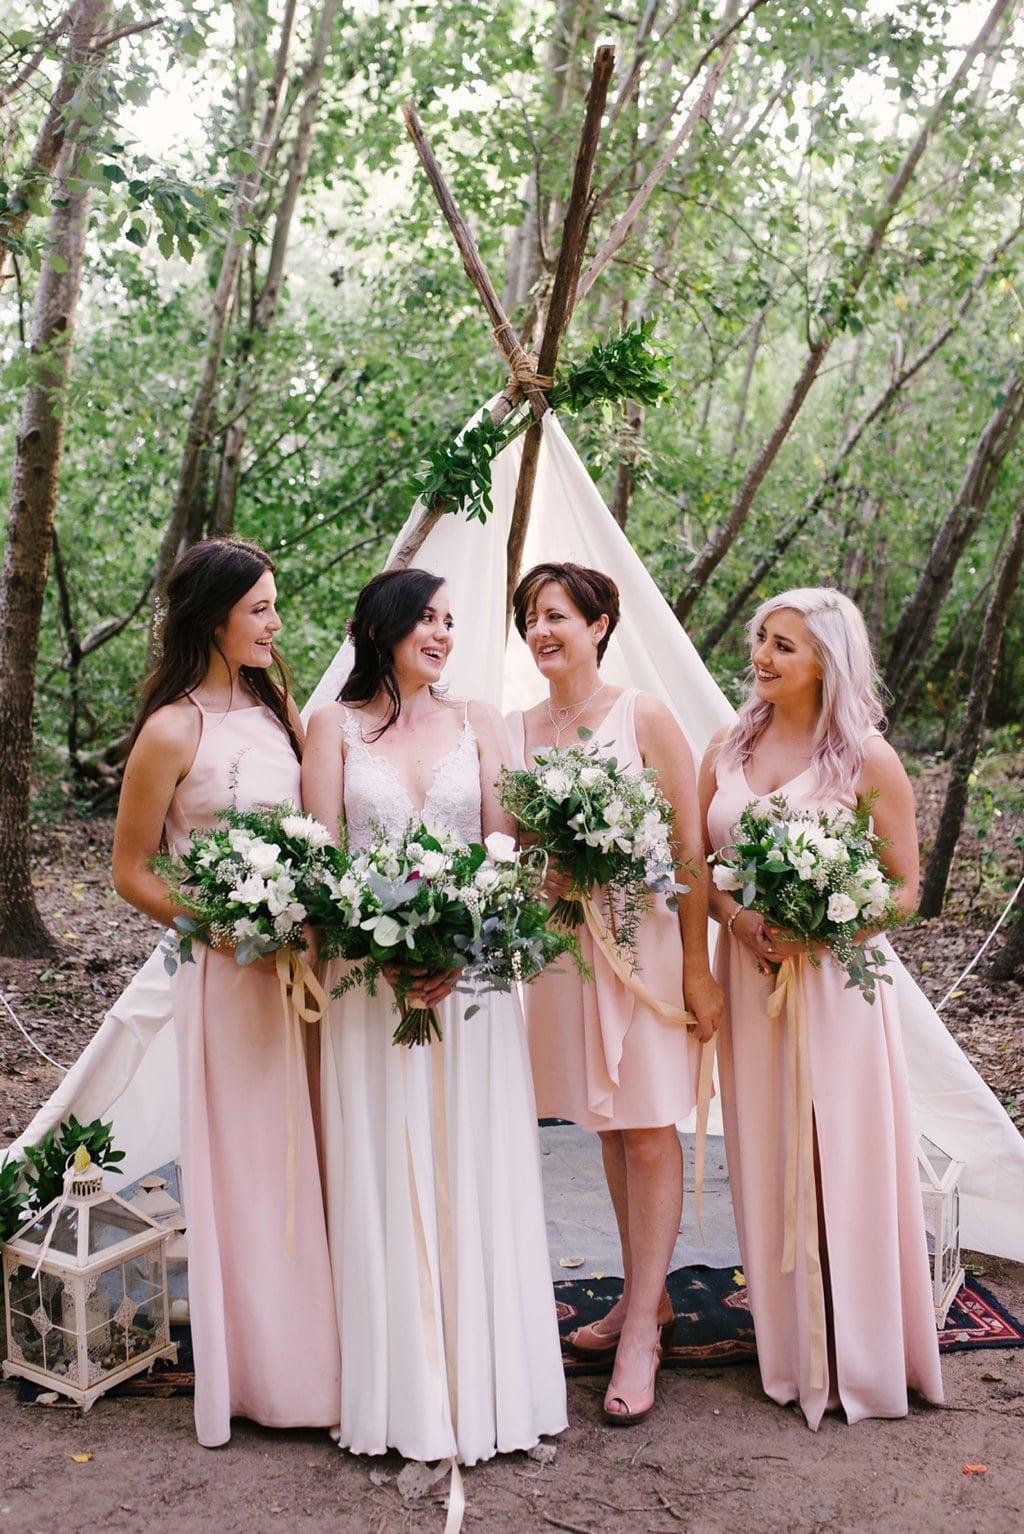 Bridesmaids in Front of Boho Tipi | Image: Cheryl McEwan